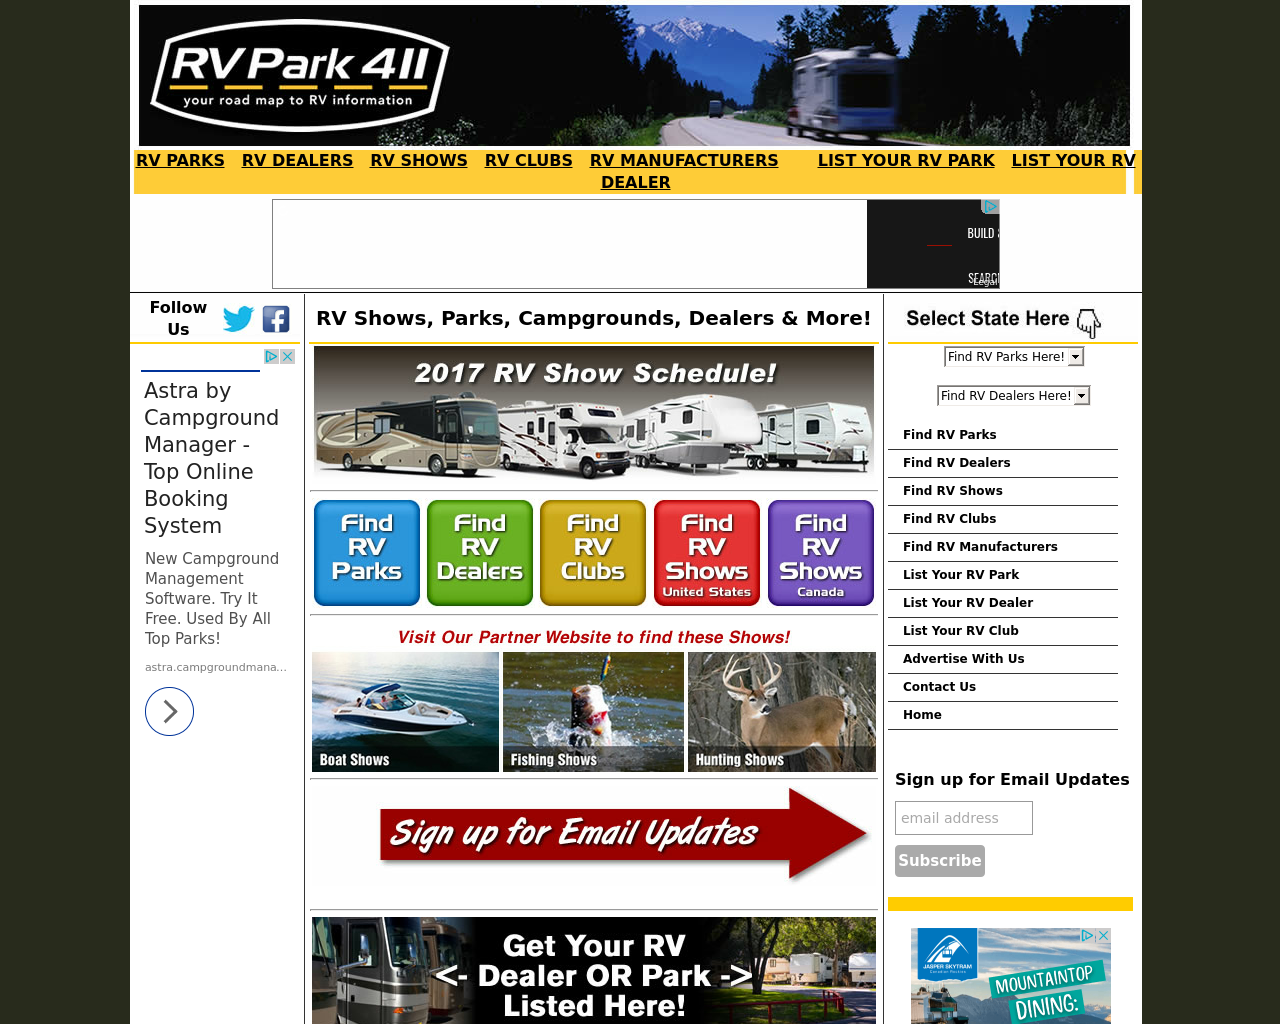 RV-Park-411-Advertising-Reviews-Pricing